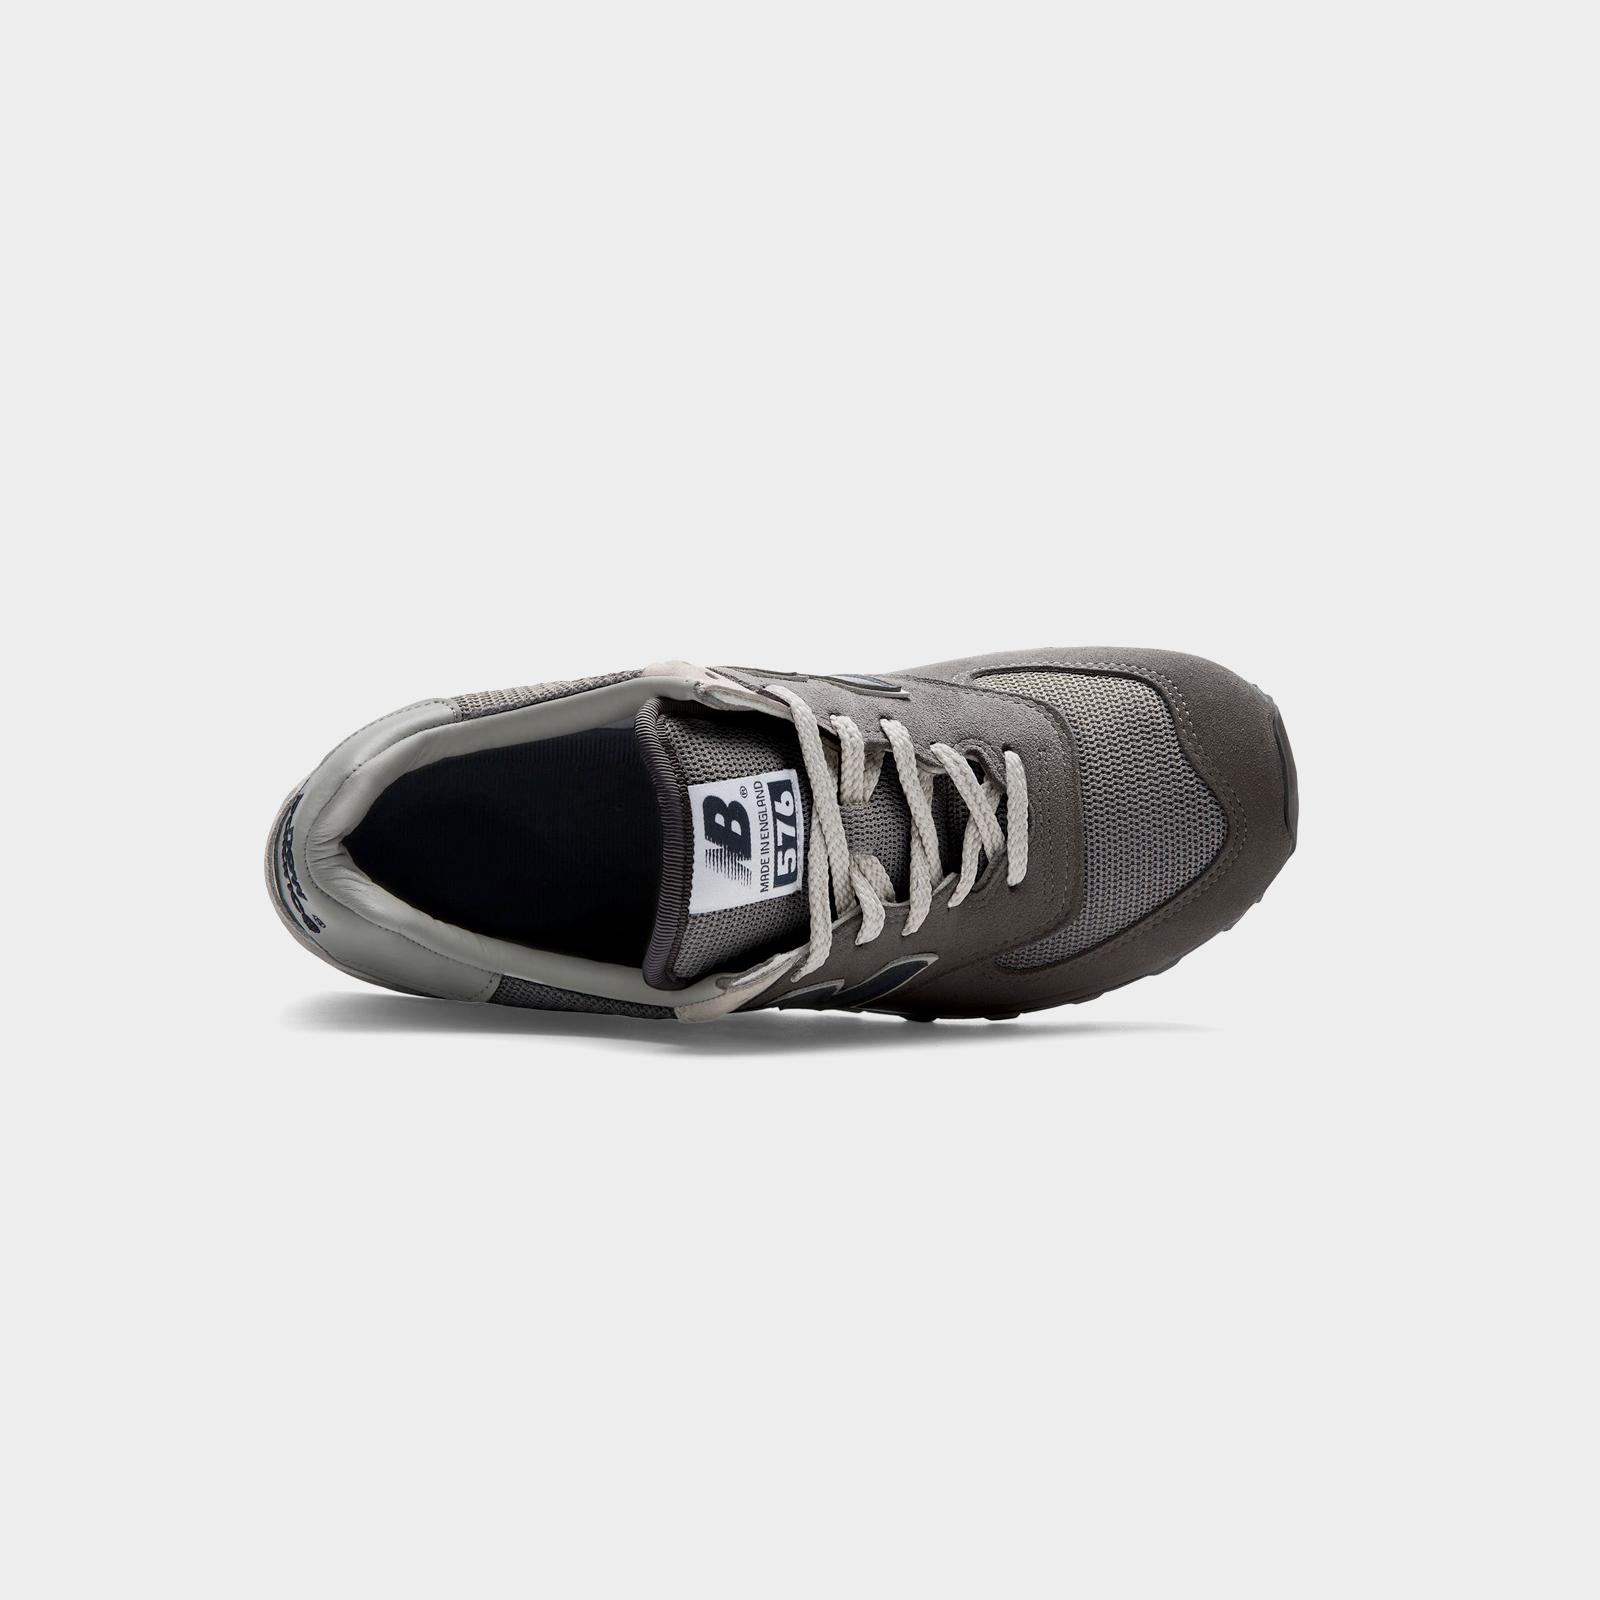 quality design 256ab b2254 New Balance OM576 - Om576ogg - Sneakersnstuff   sneakers ...